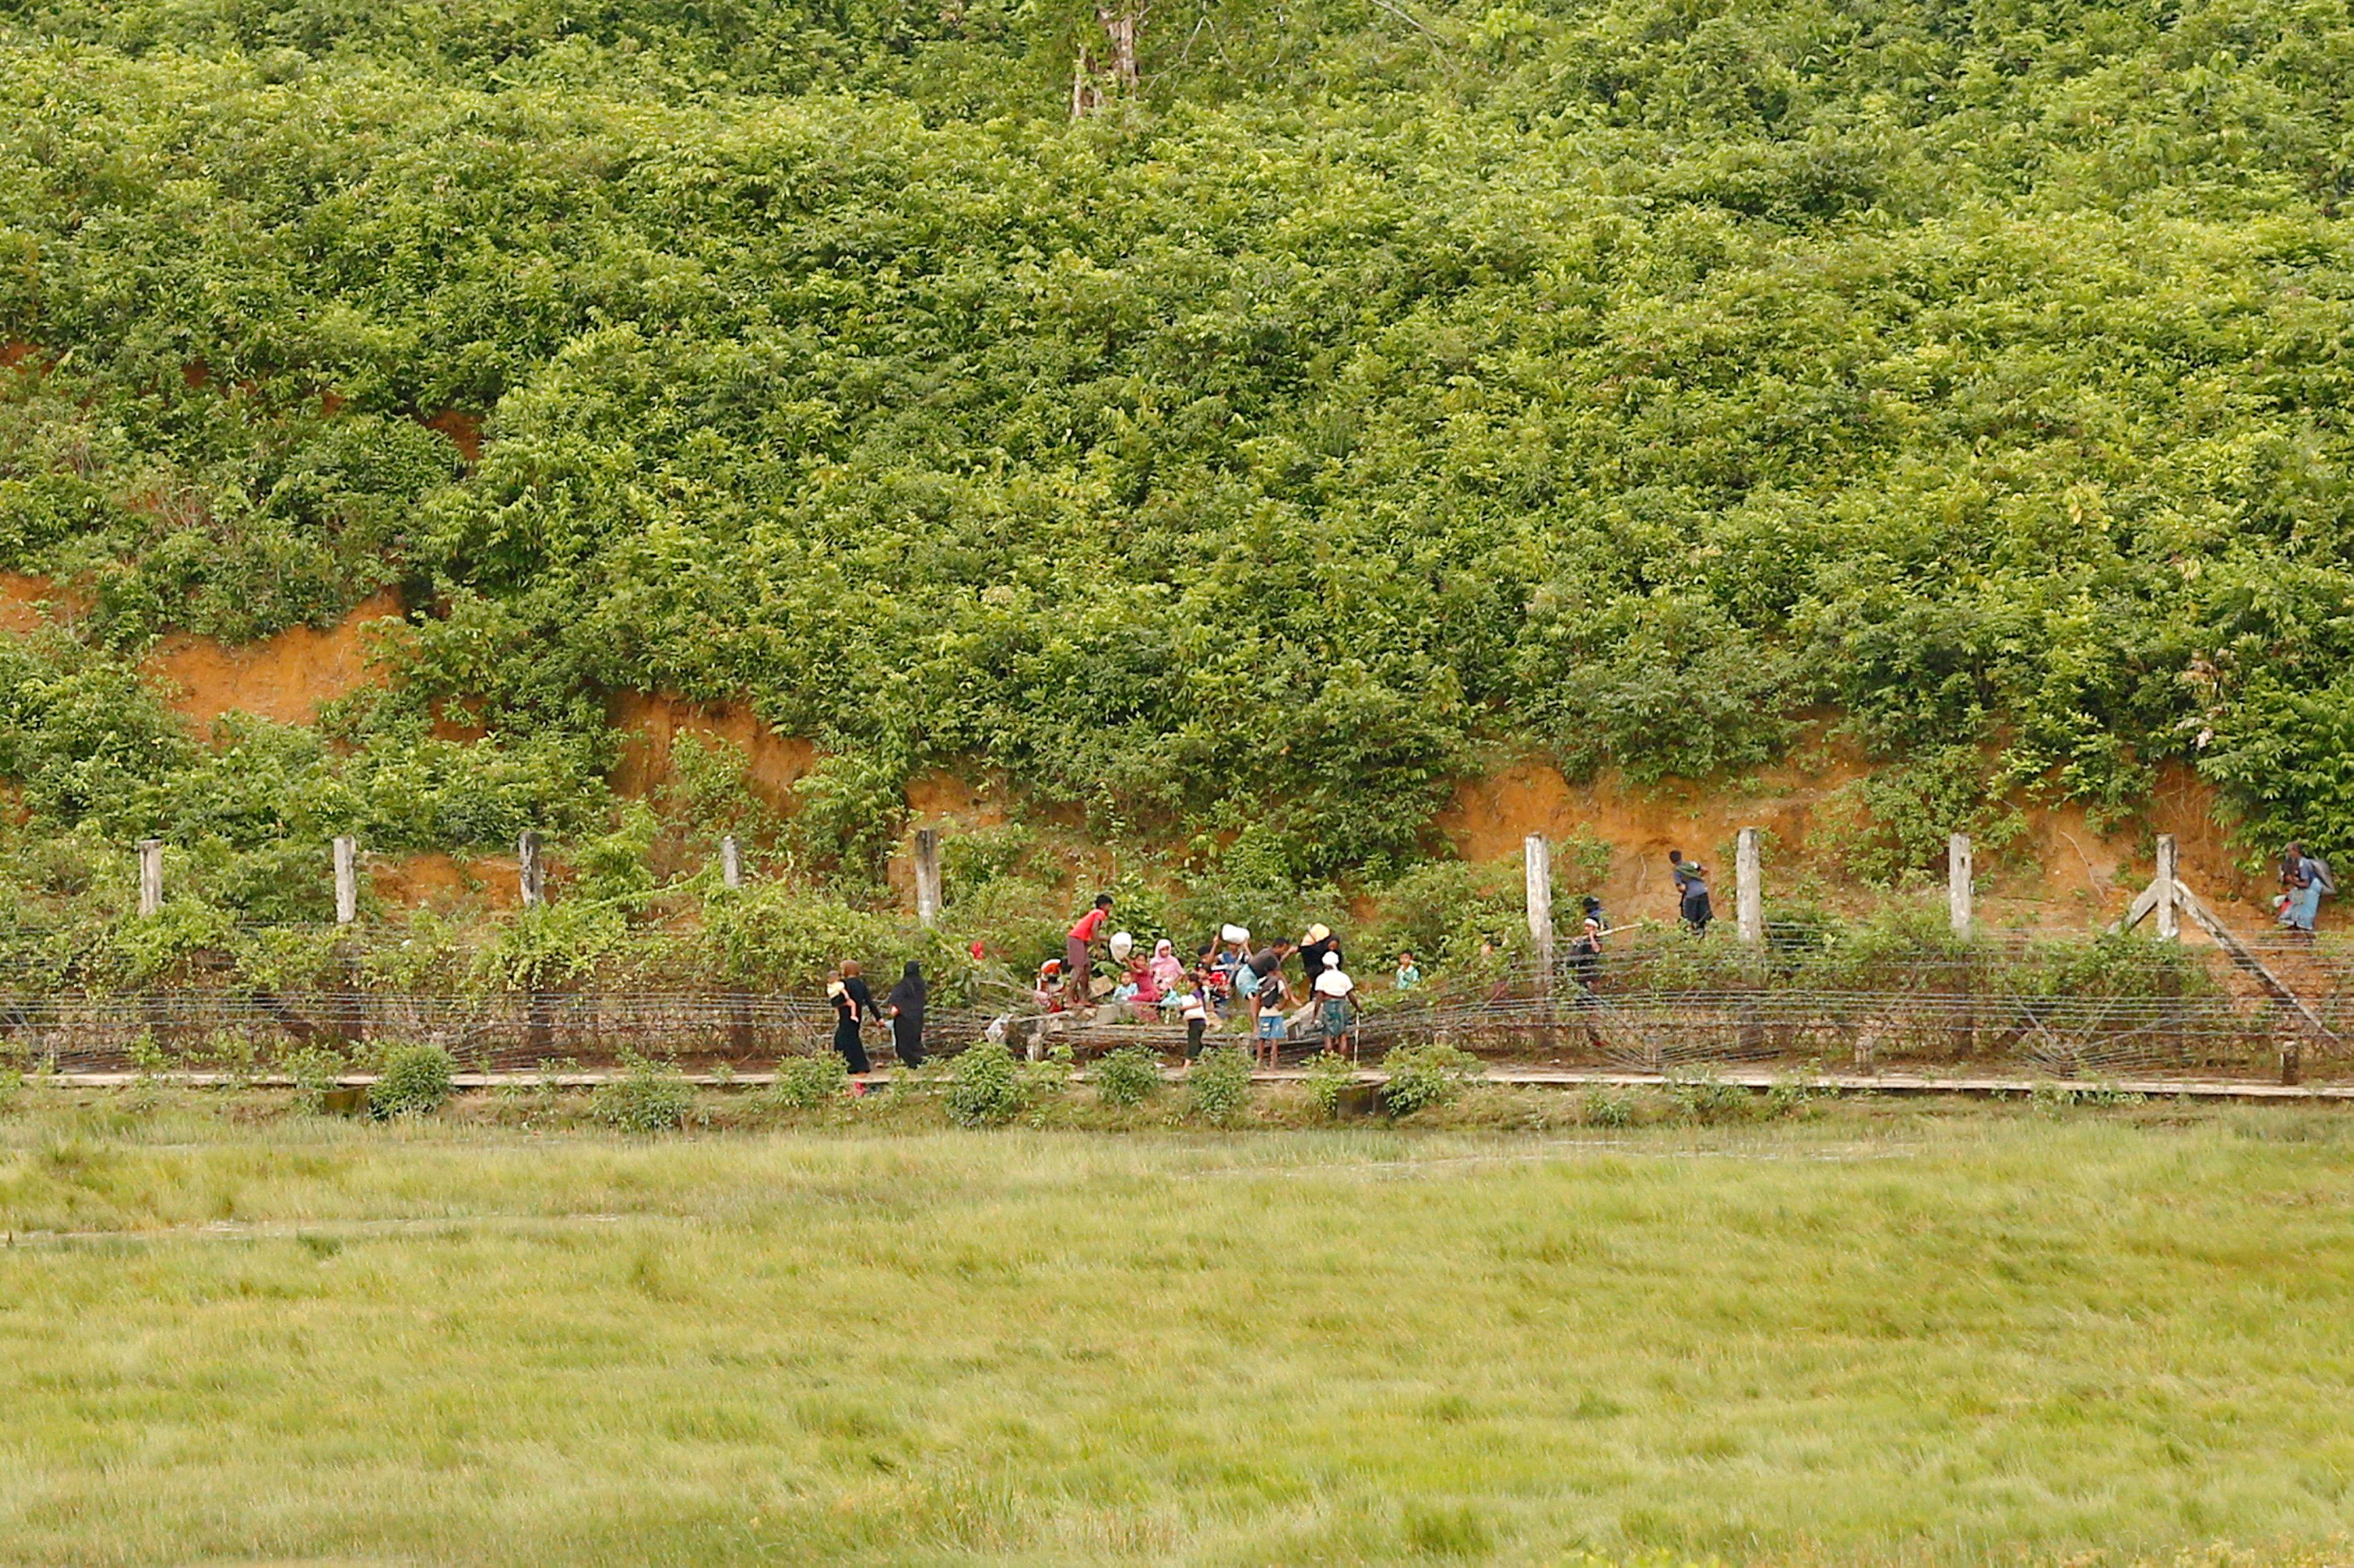 Myanmar evacuates 4,000 non-Muslim villagers amid clashes in Rakhine state